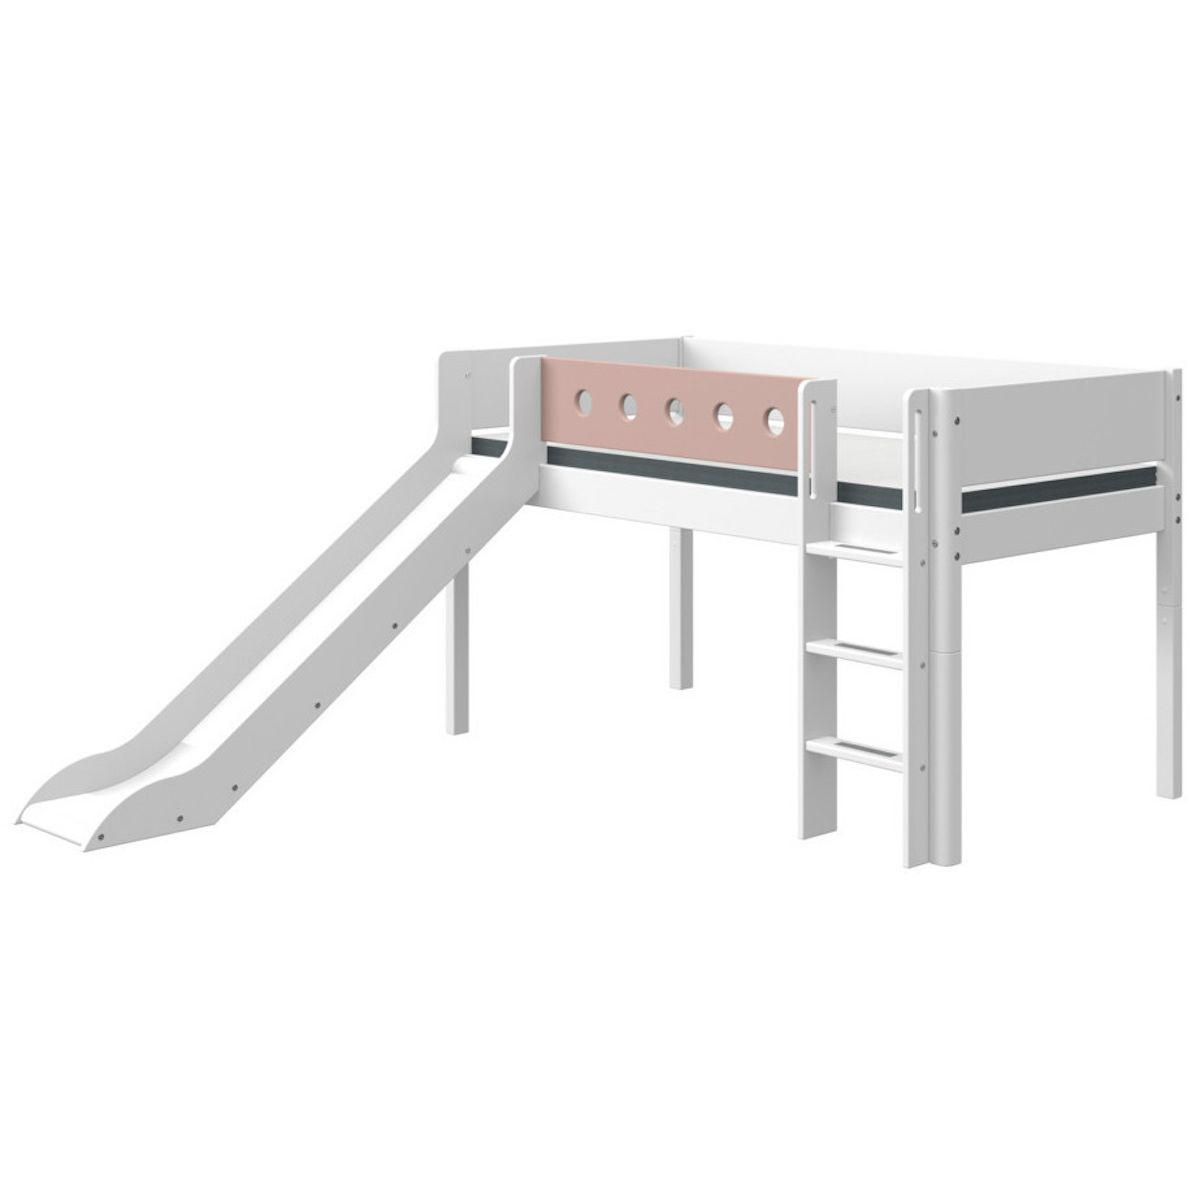 Cama media alta 90x200cm escalera recta-tobogán WHITE Flexa blanco-rosa claro